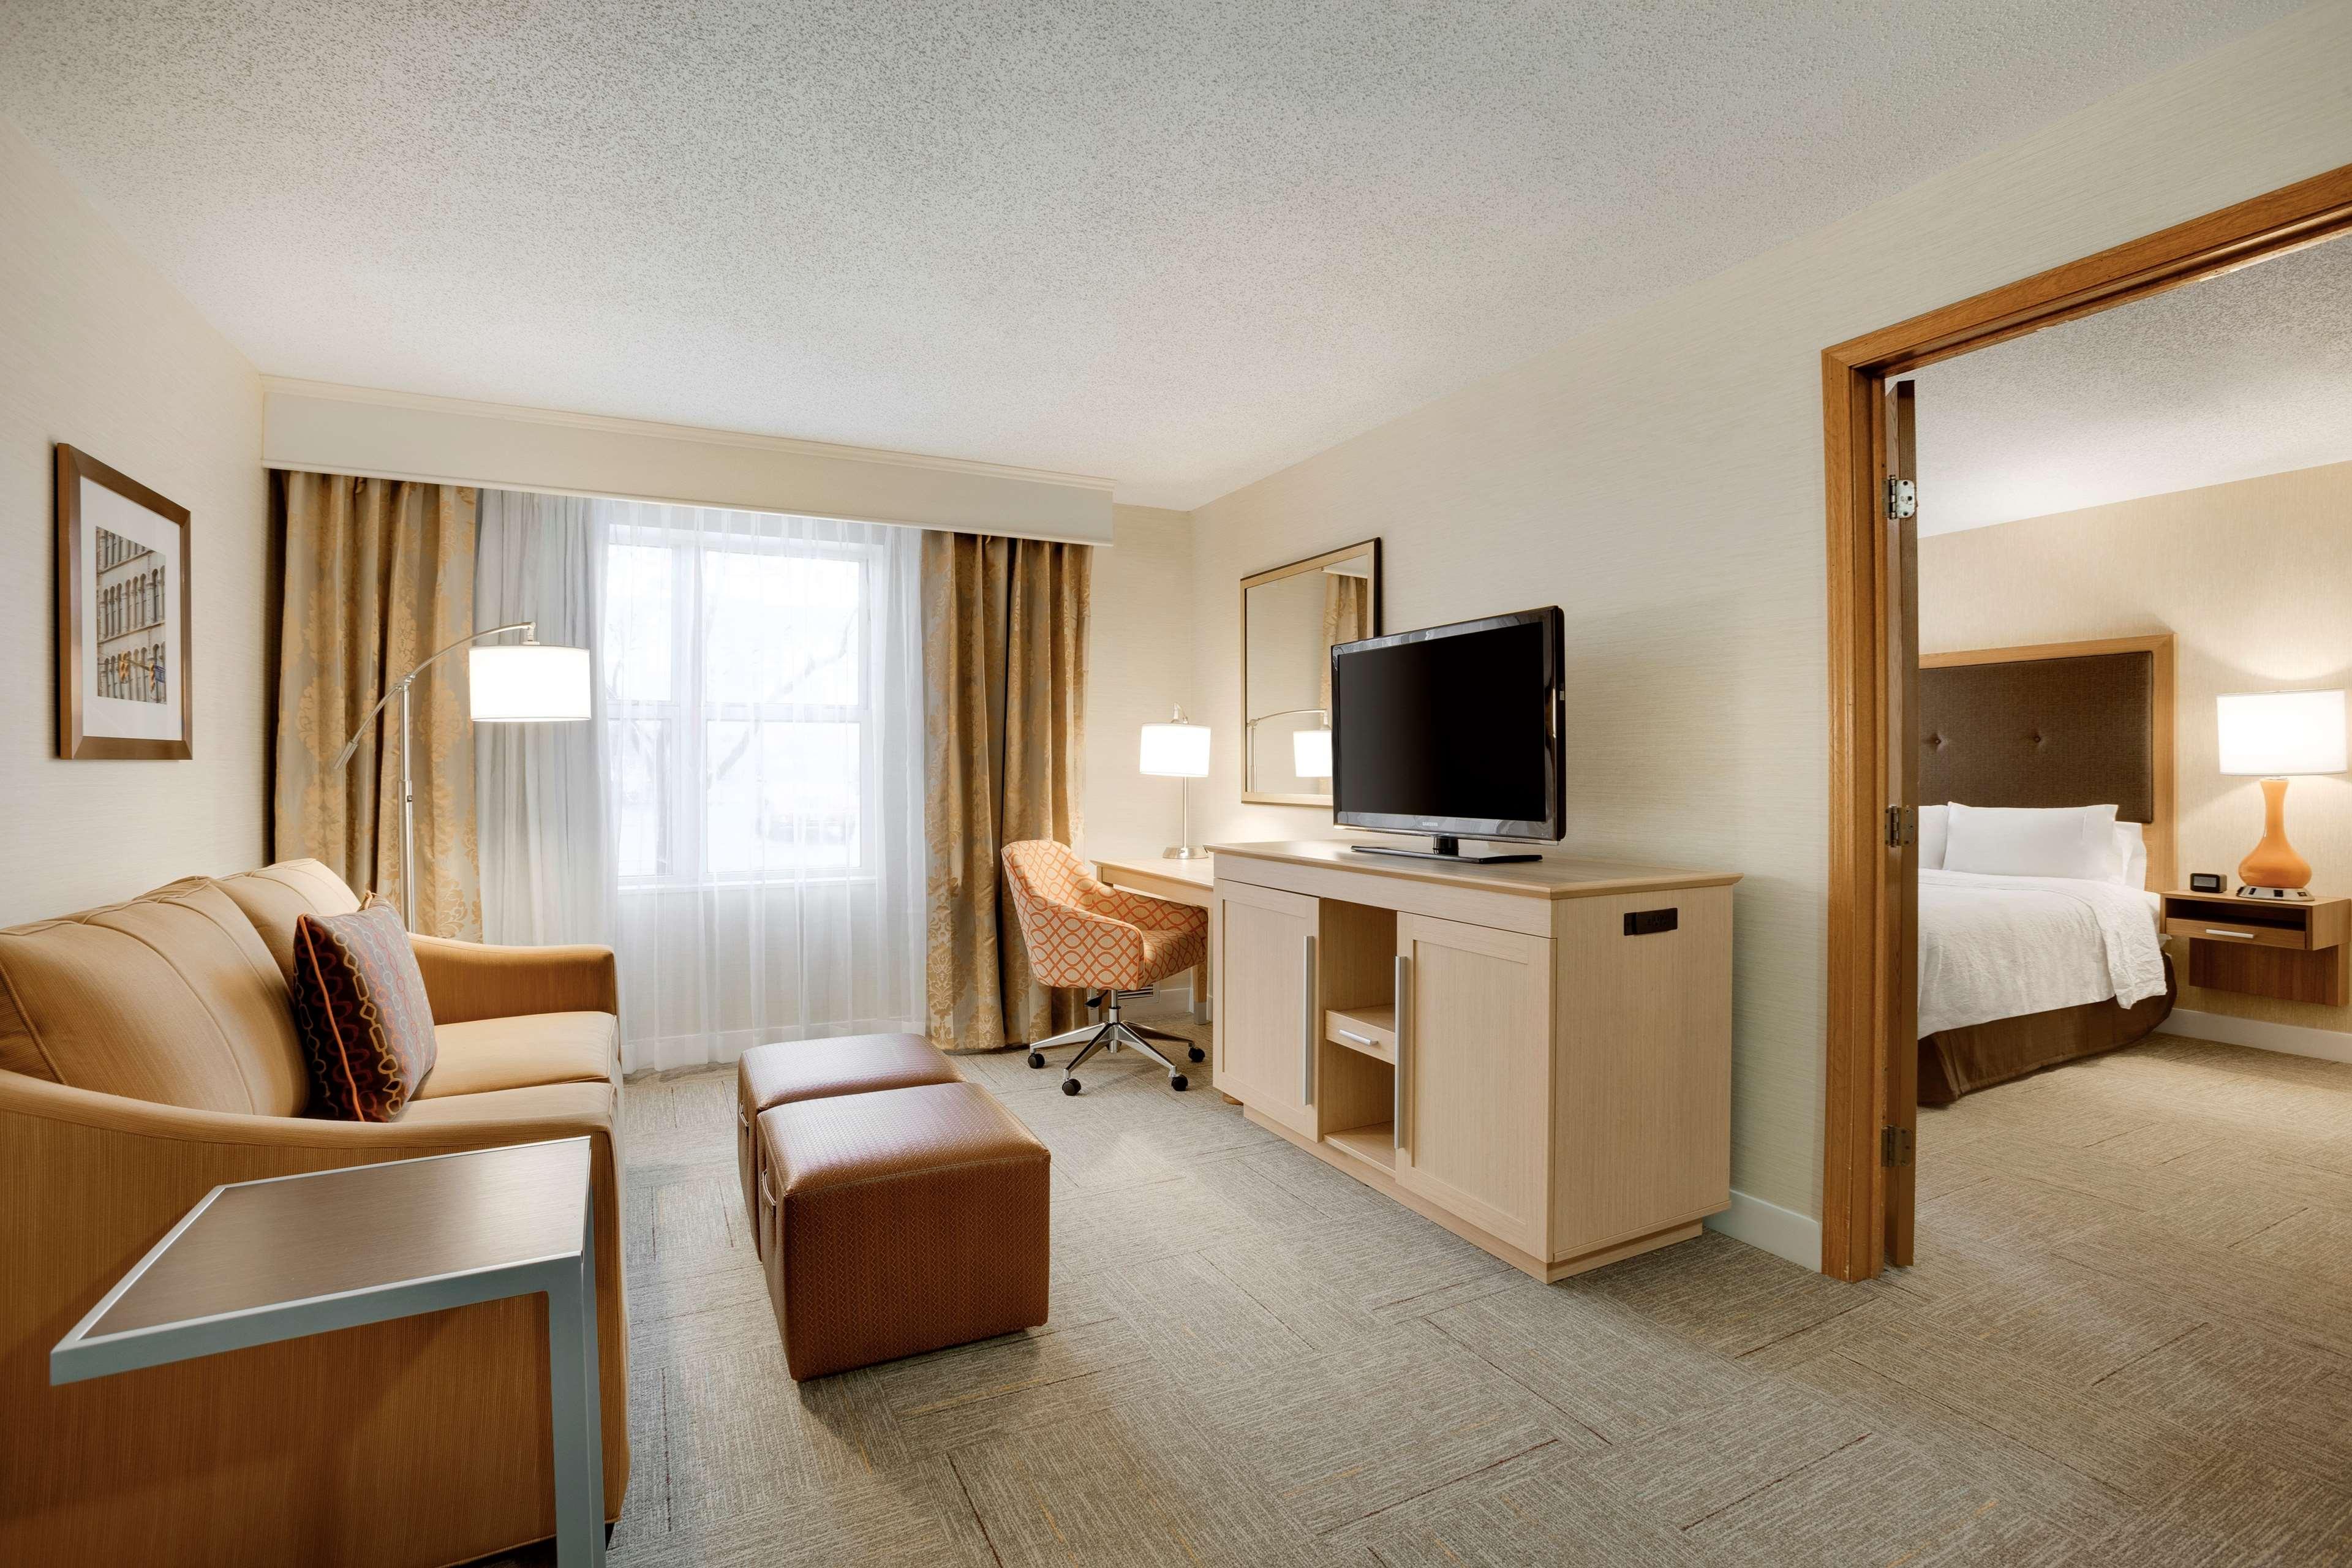 Hampton Inn & Suites Cleveland/Independence image 0